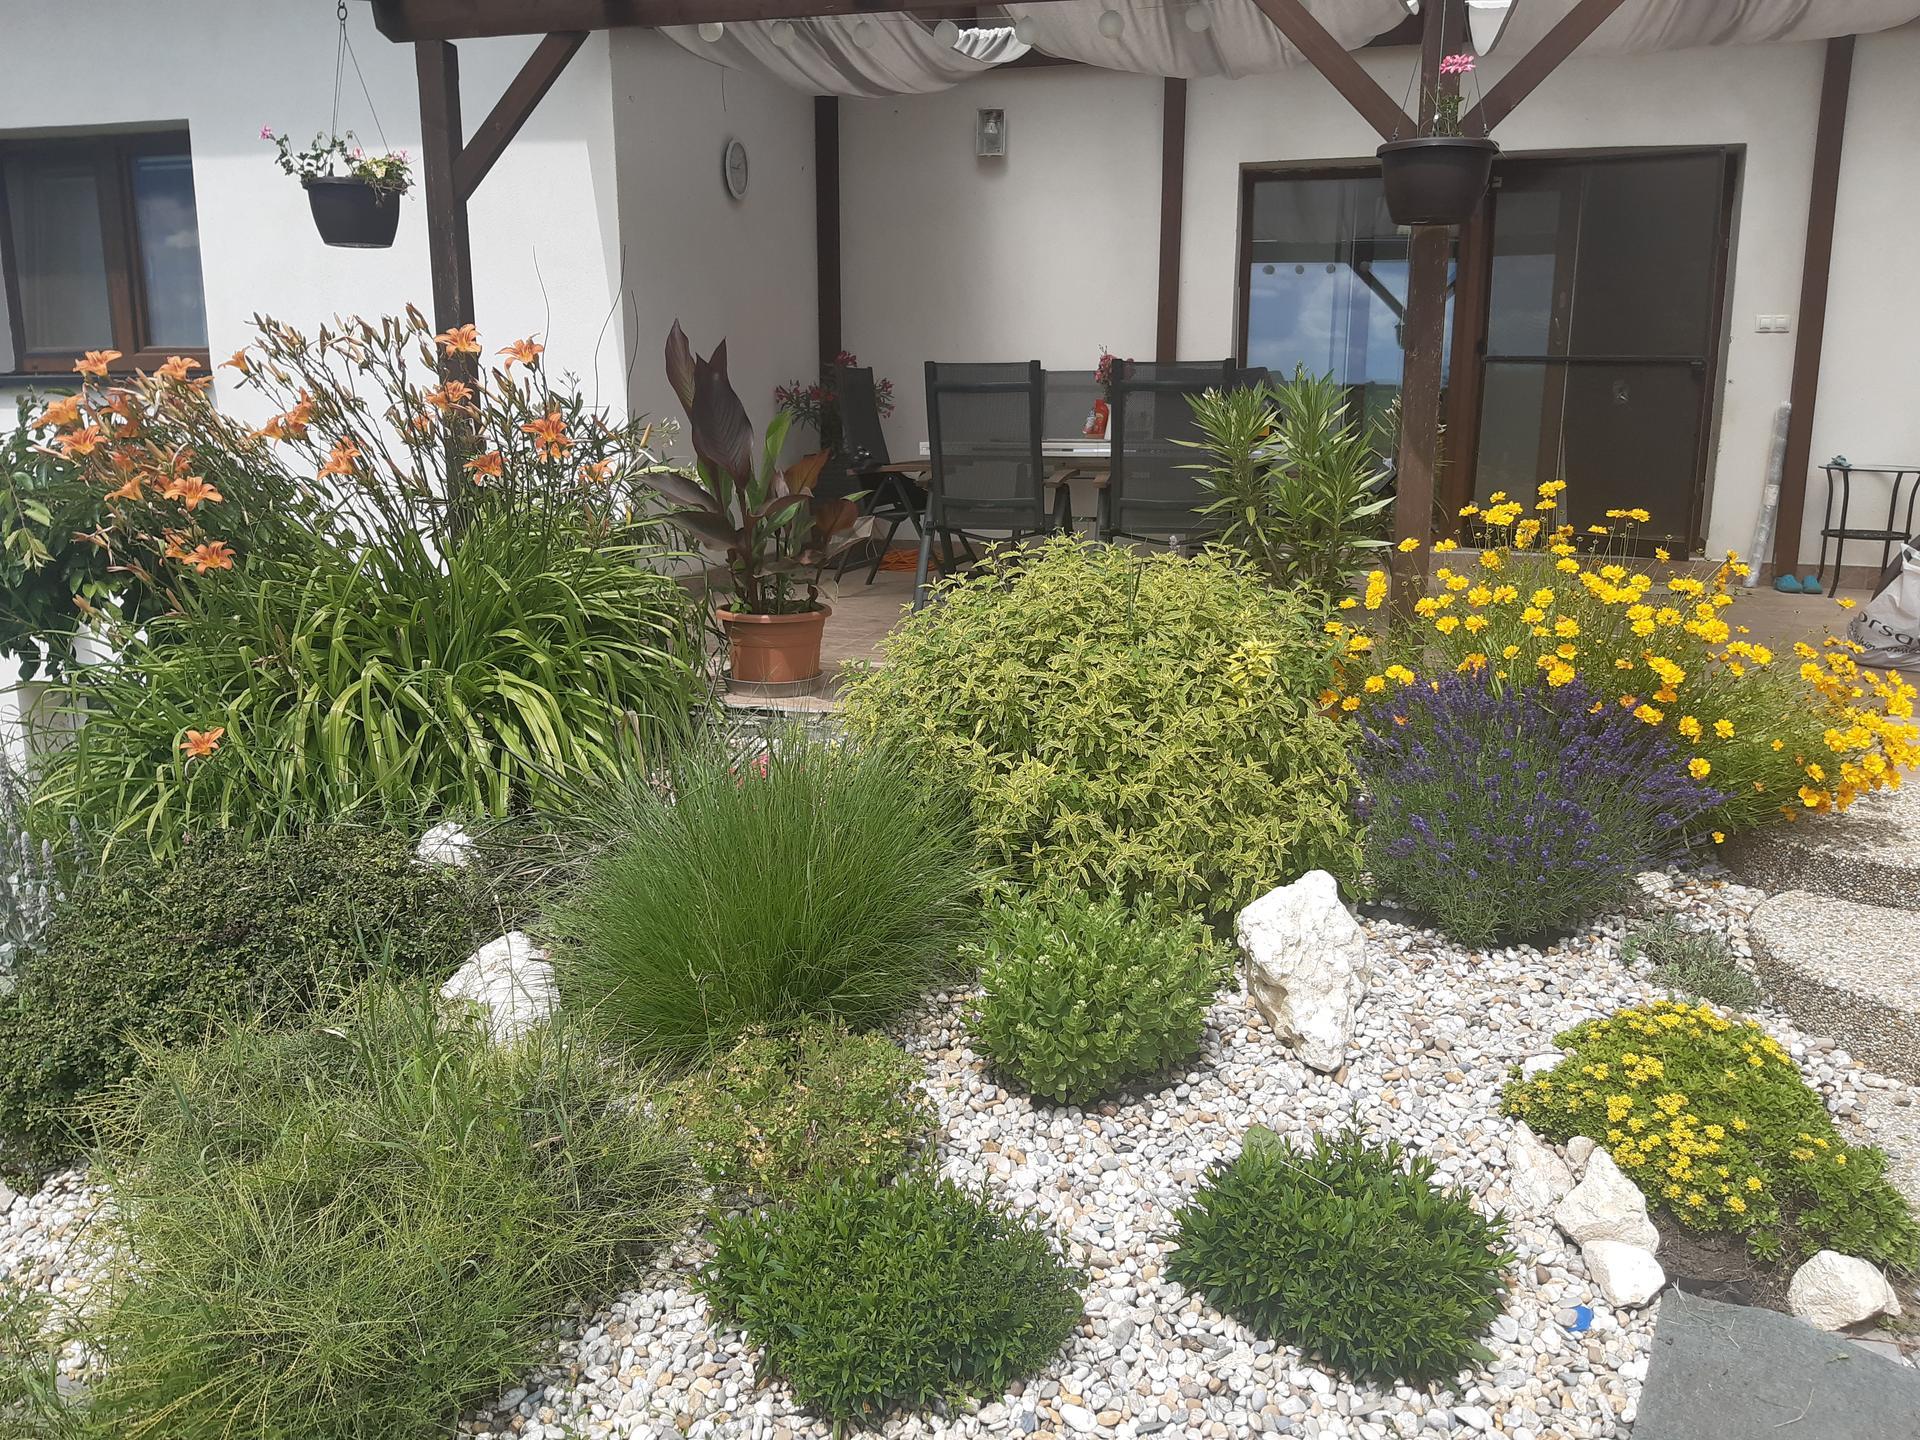 Zahrada - Obrázek č. 150